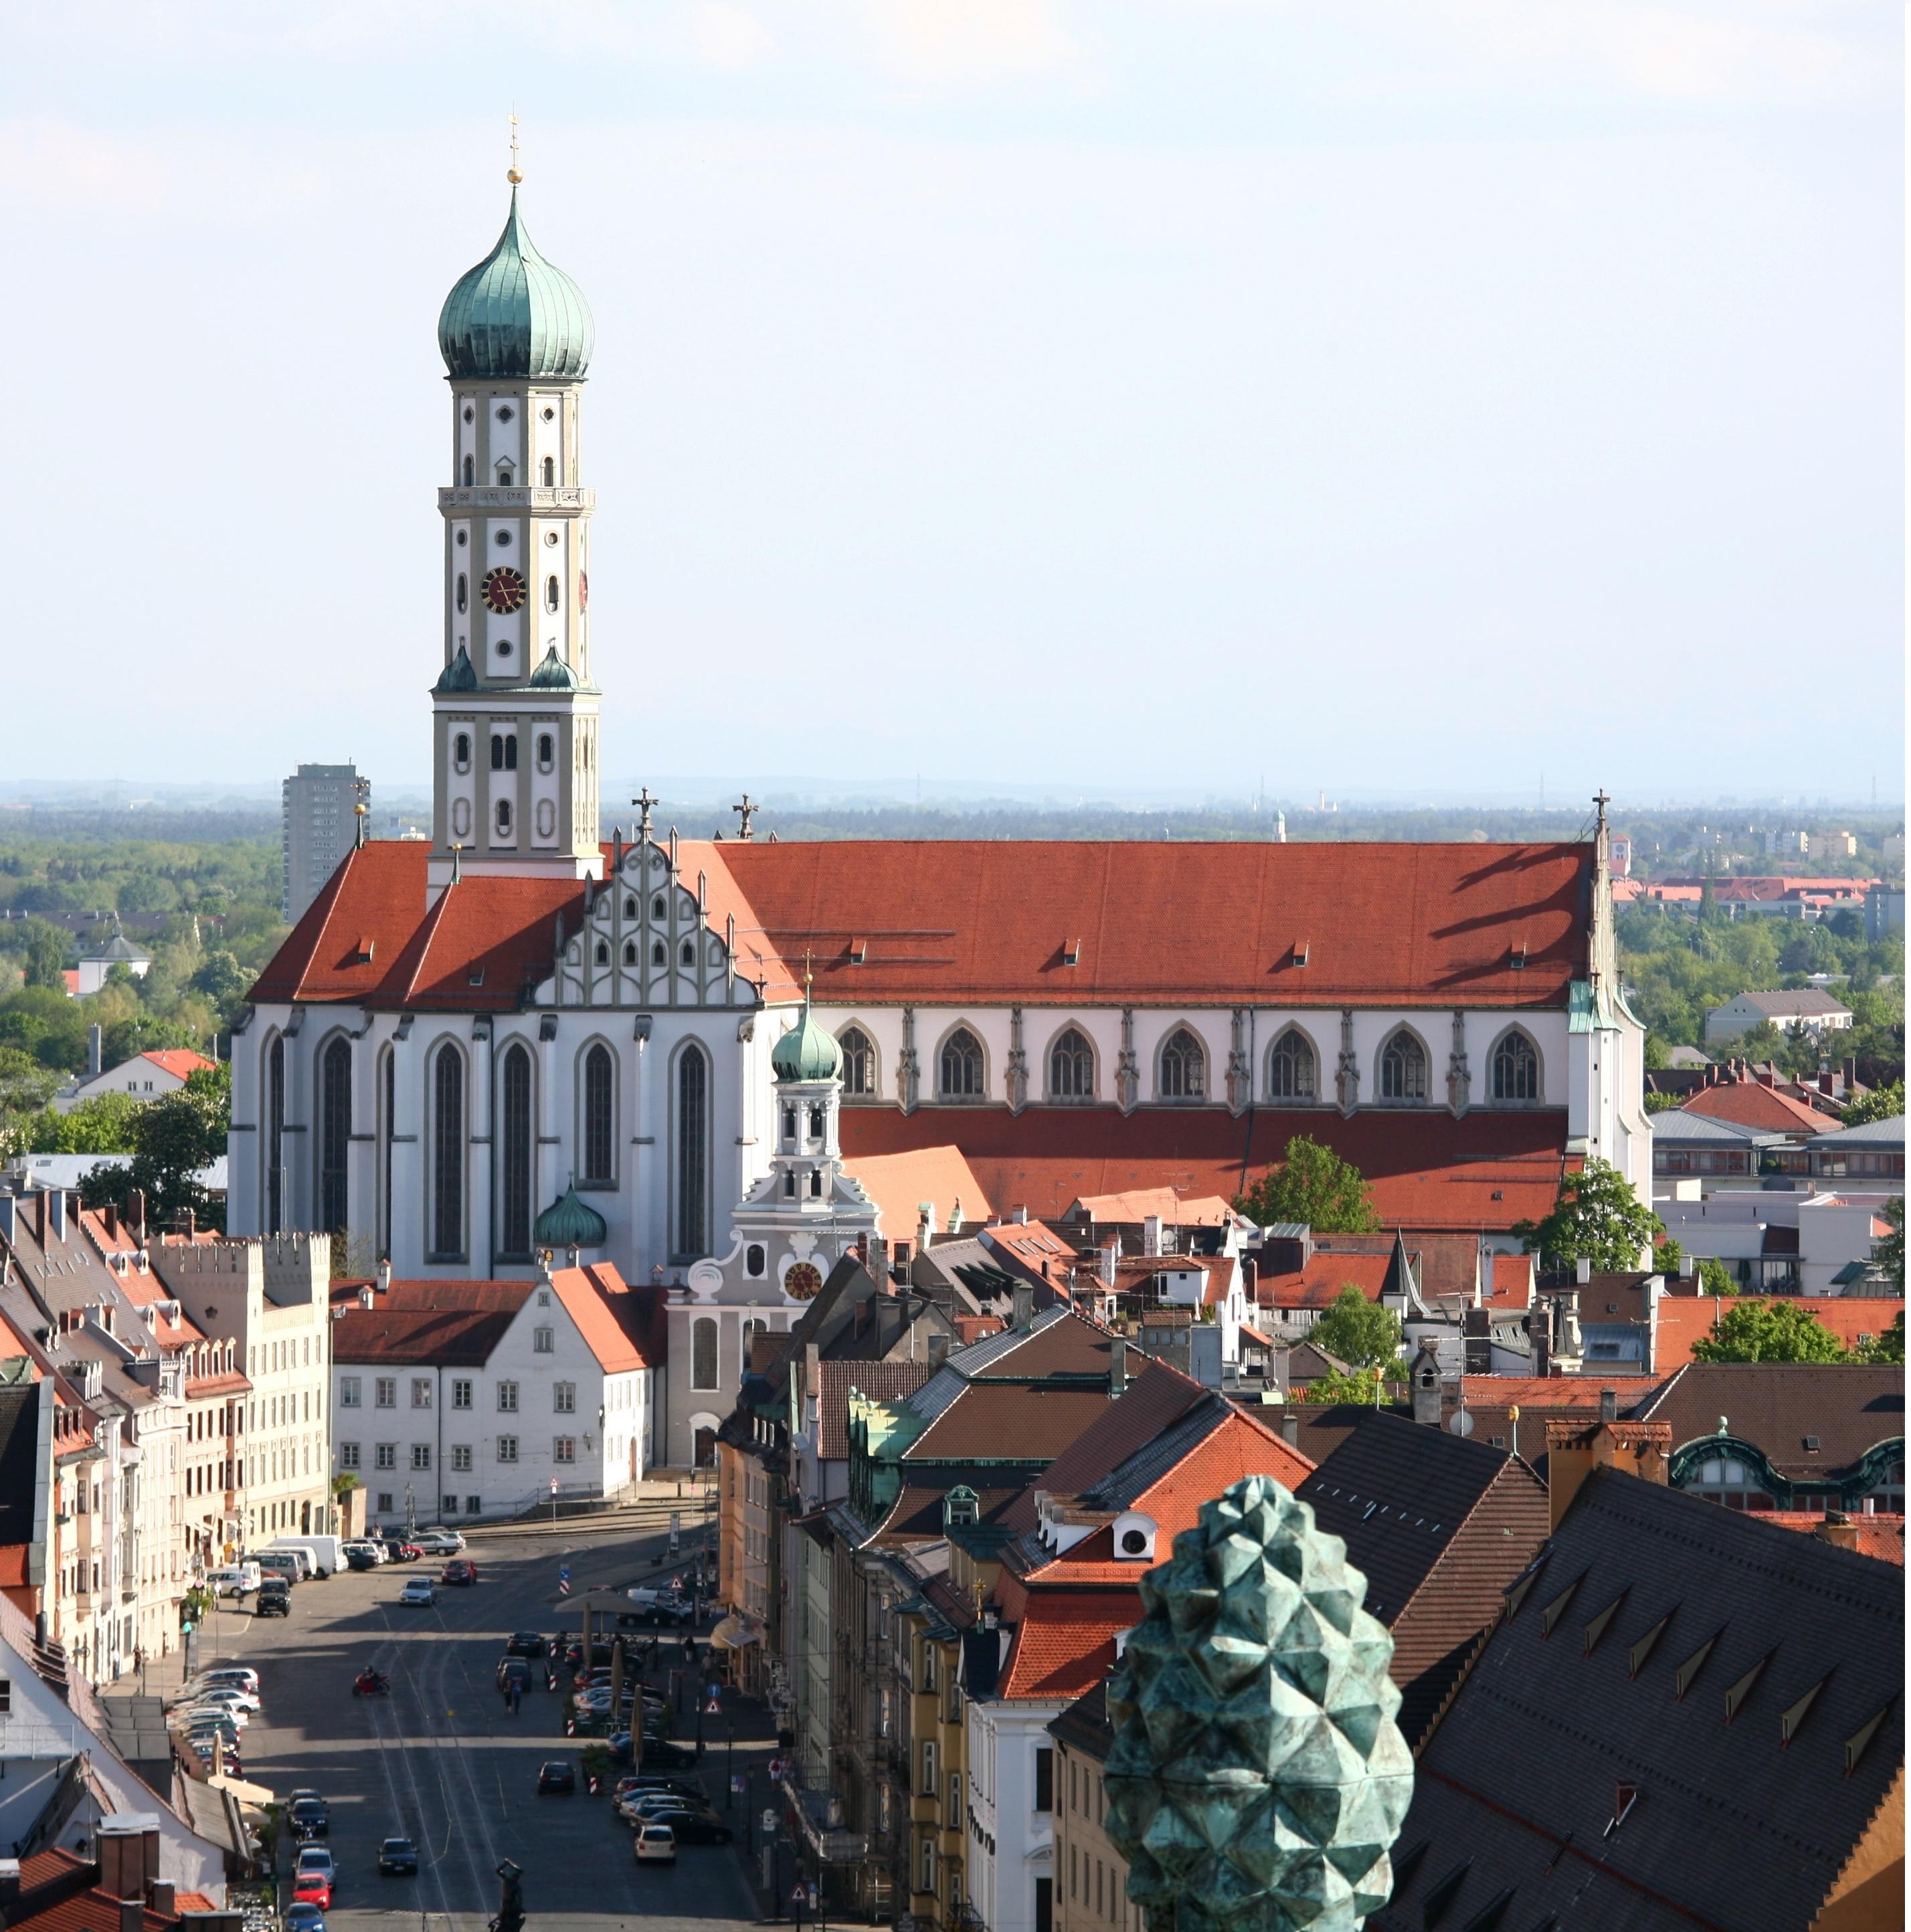 Kanzlei Augsburg